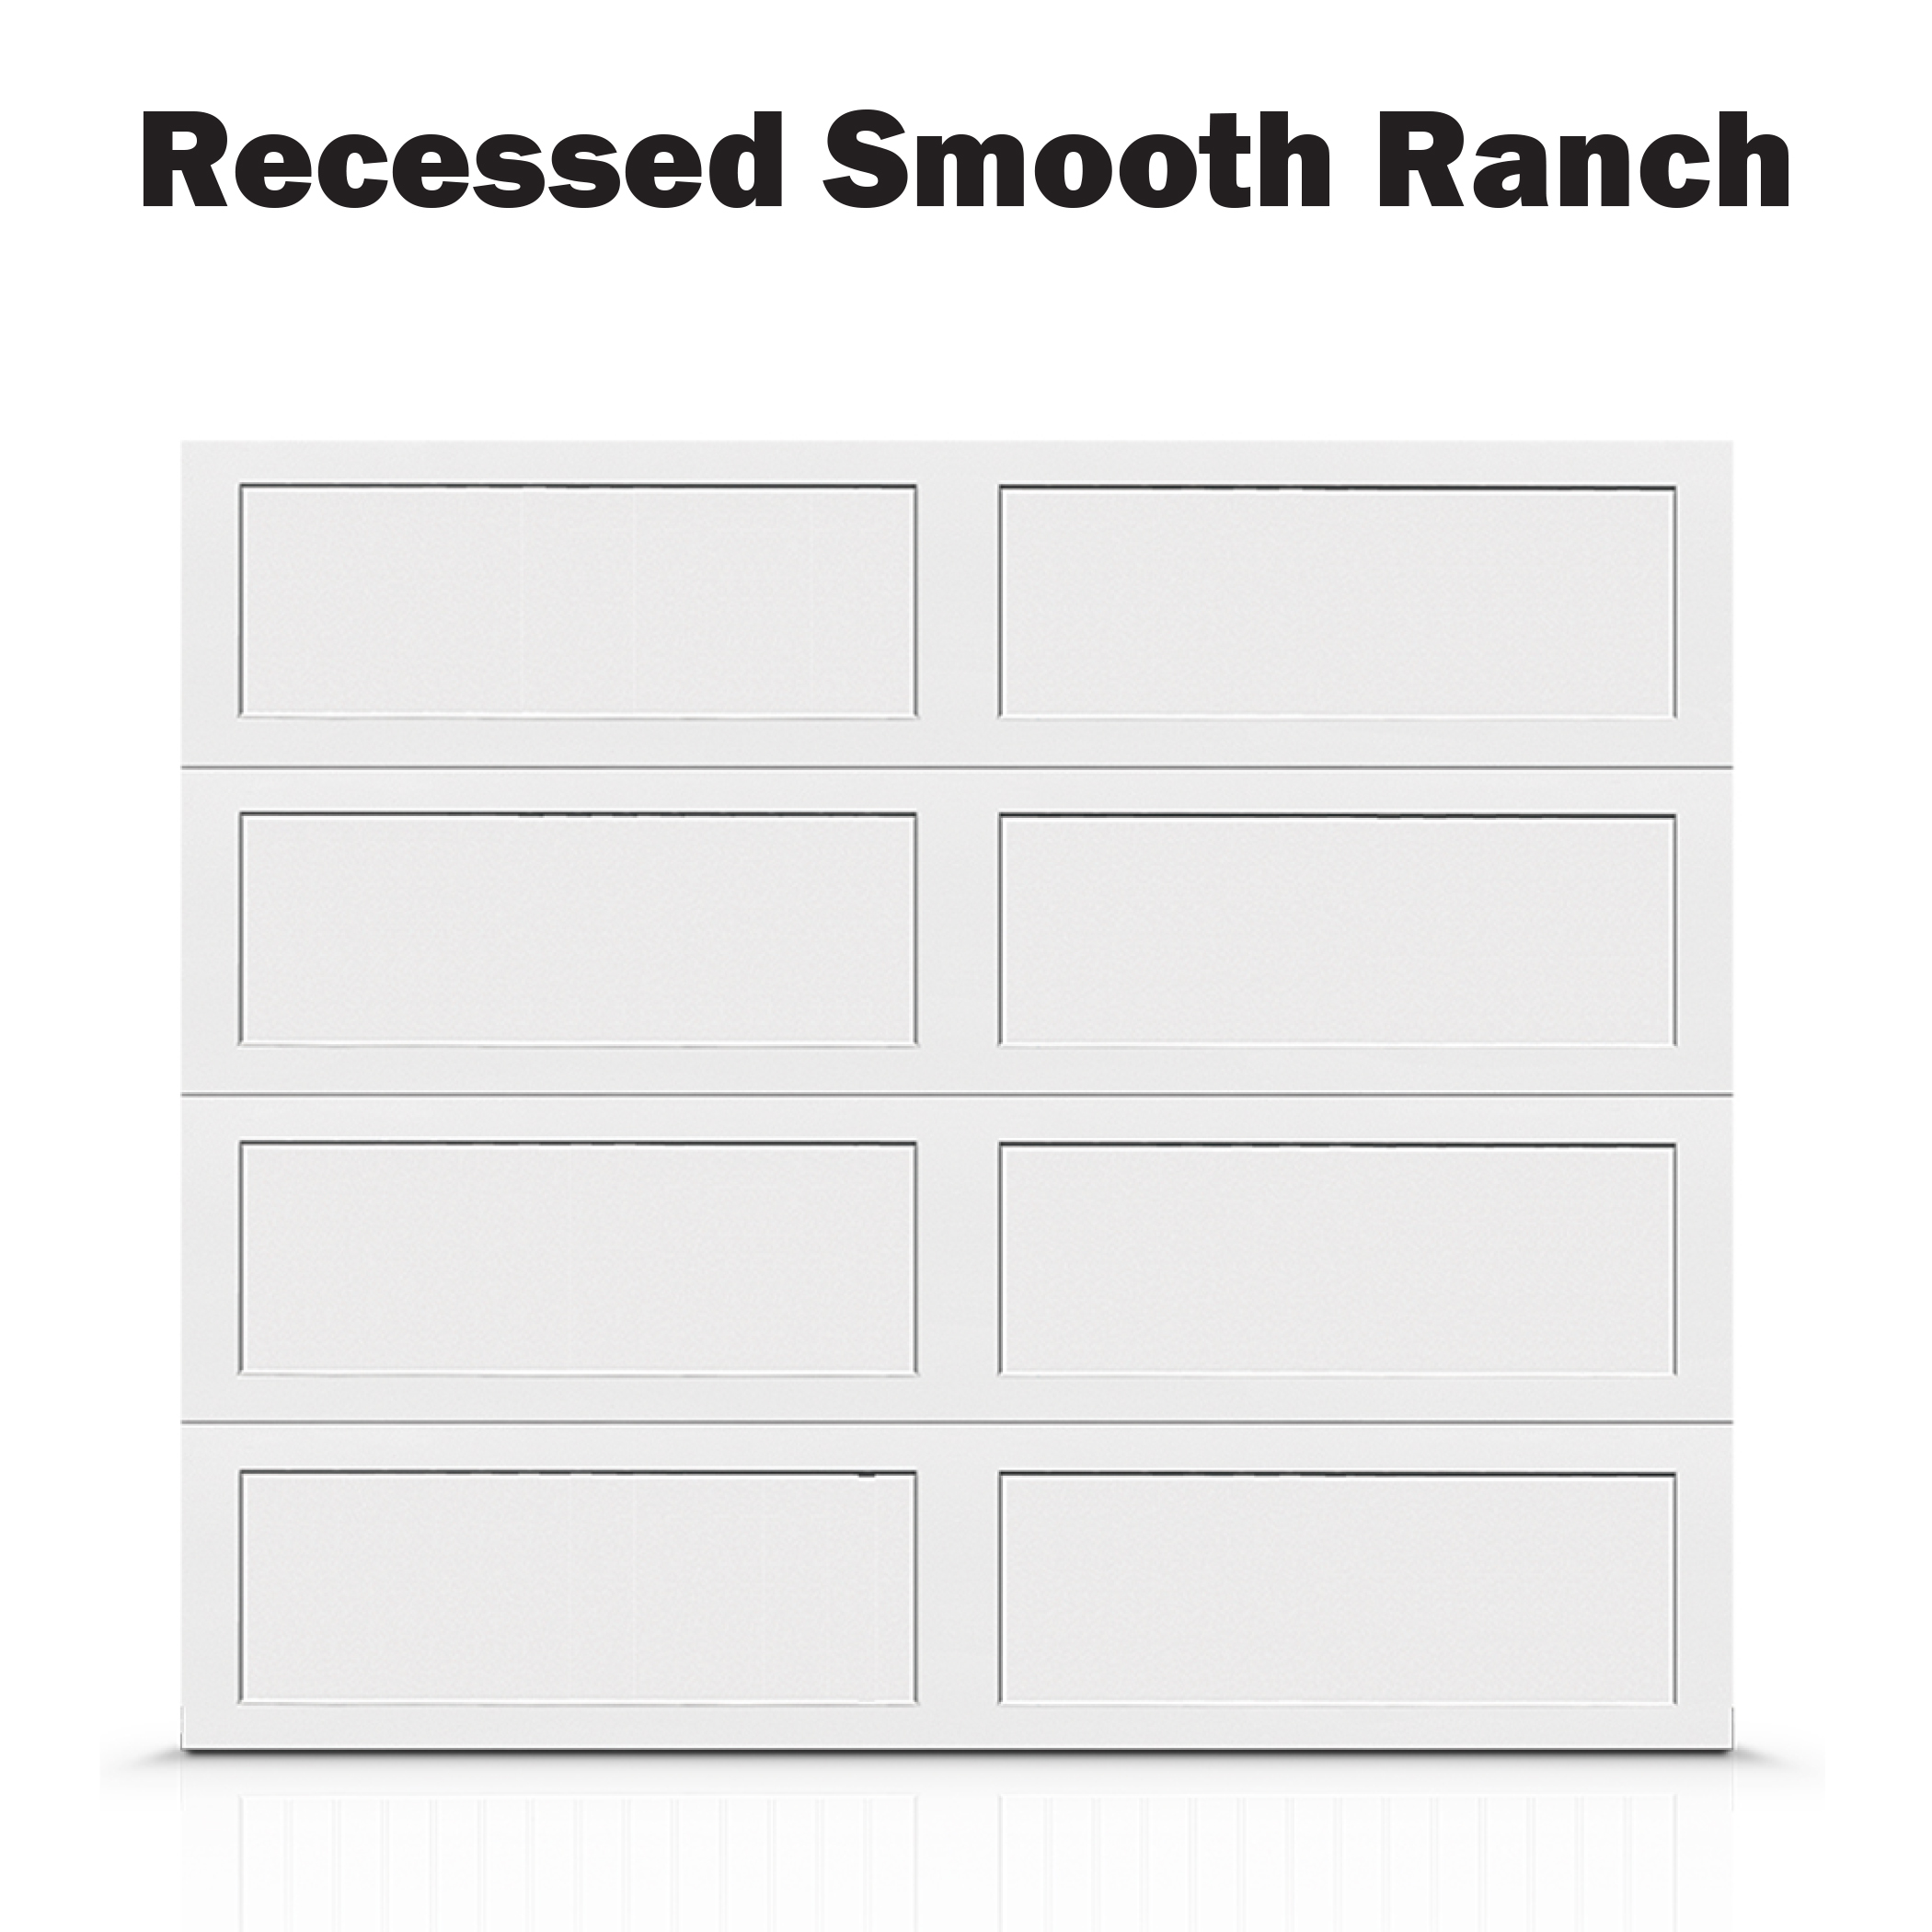 Recessed Smooth Ranch - Premium.jpg